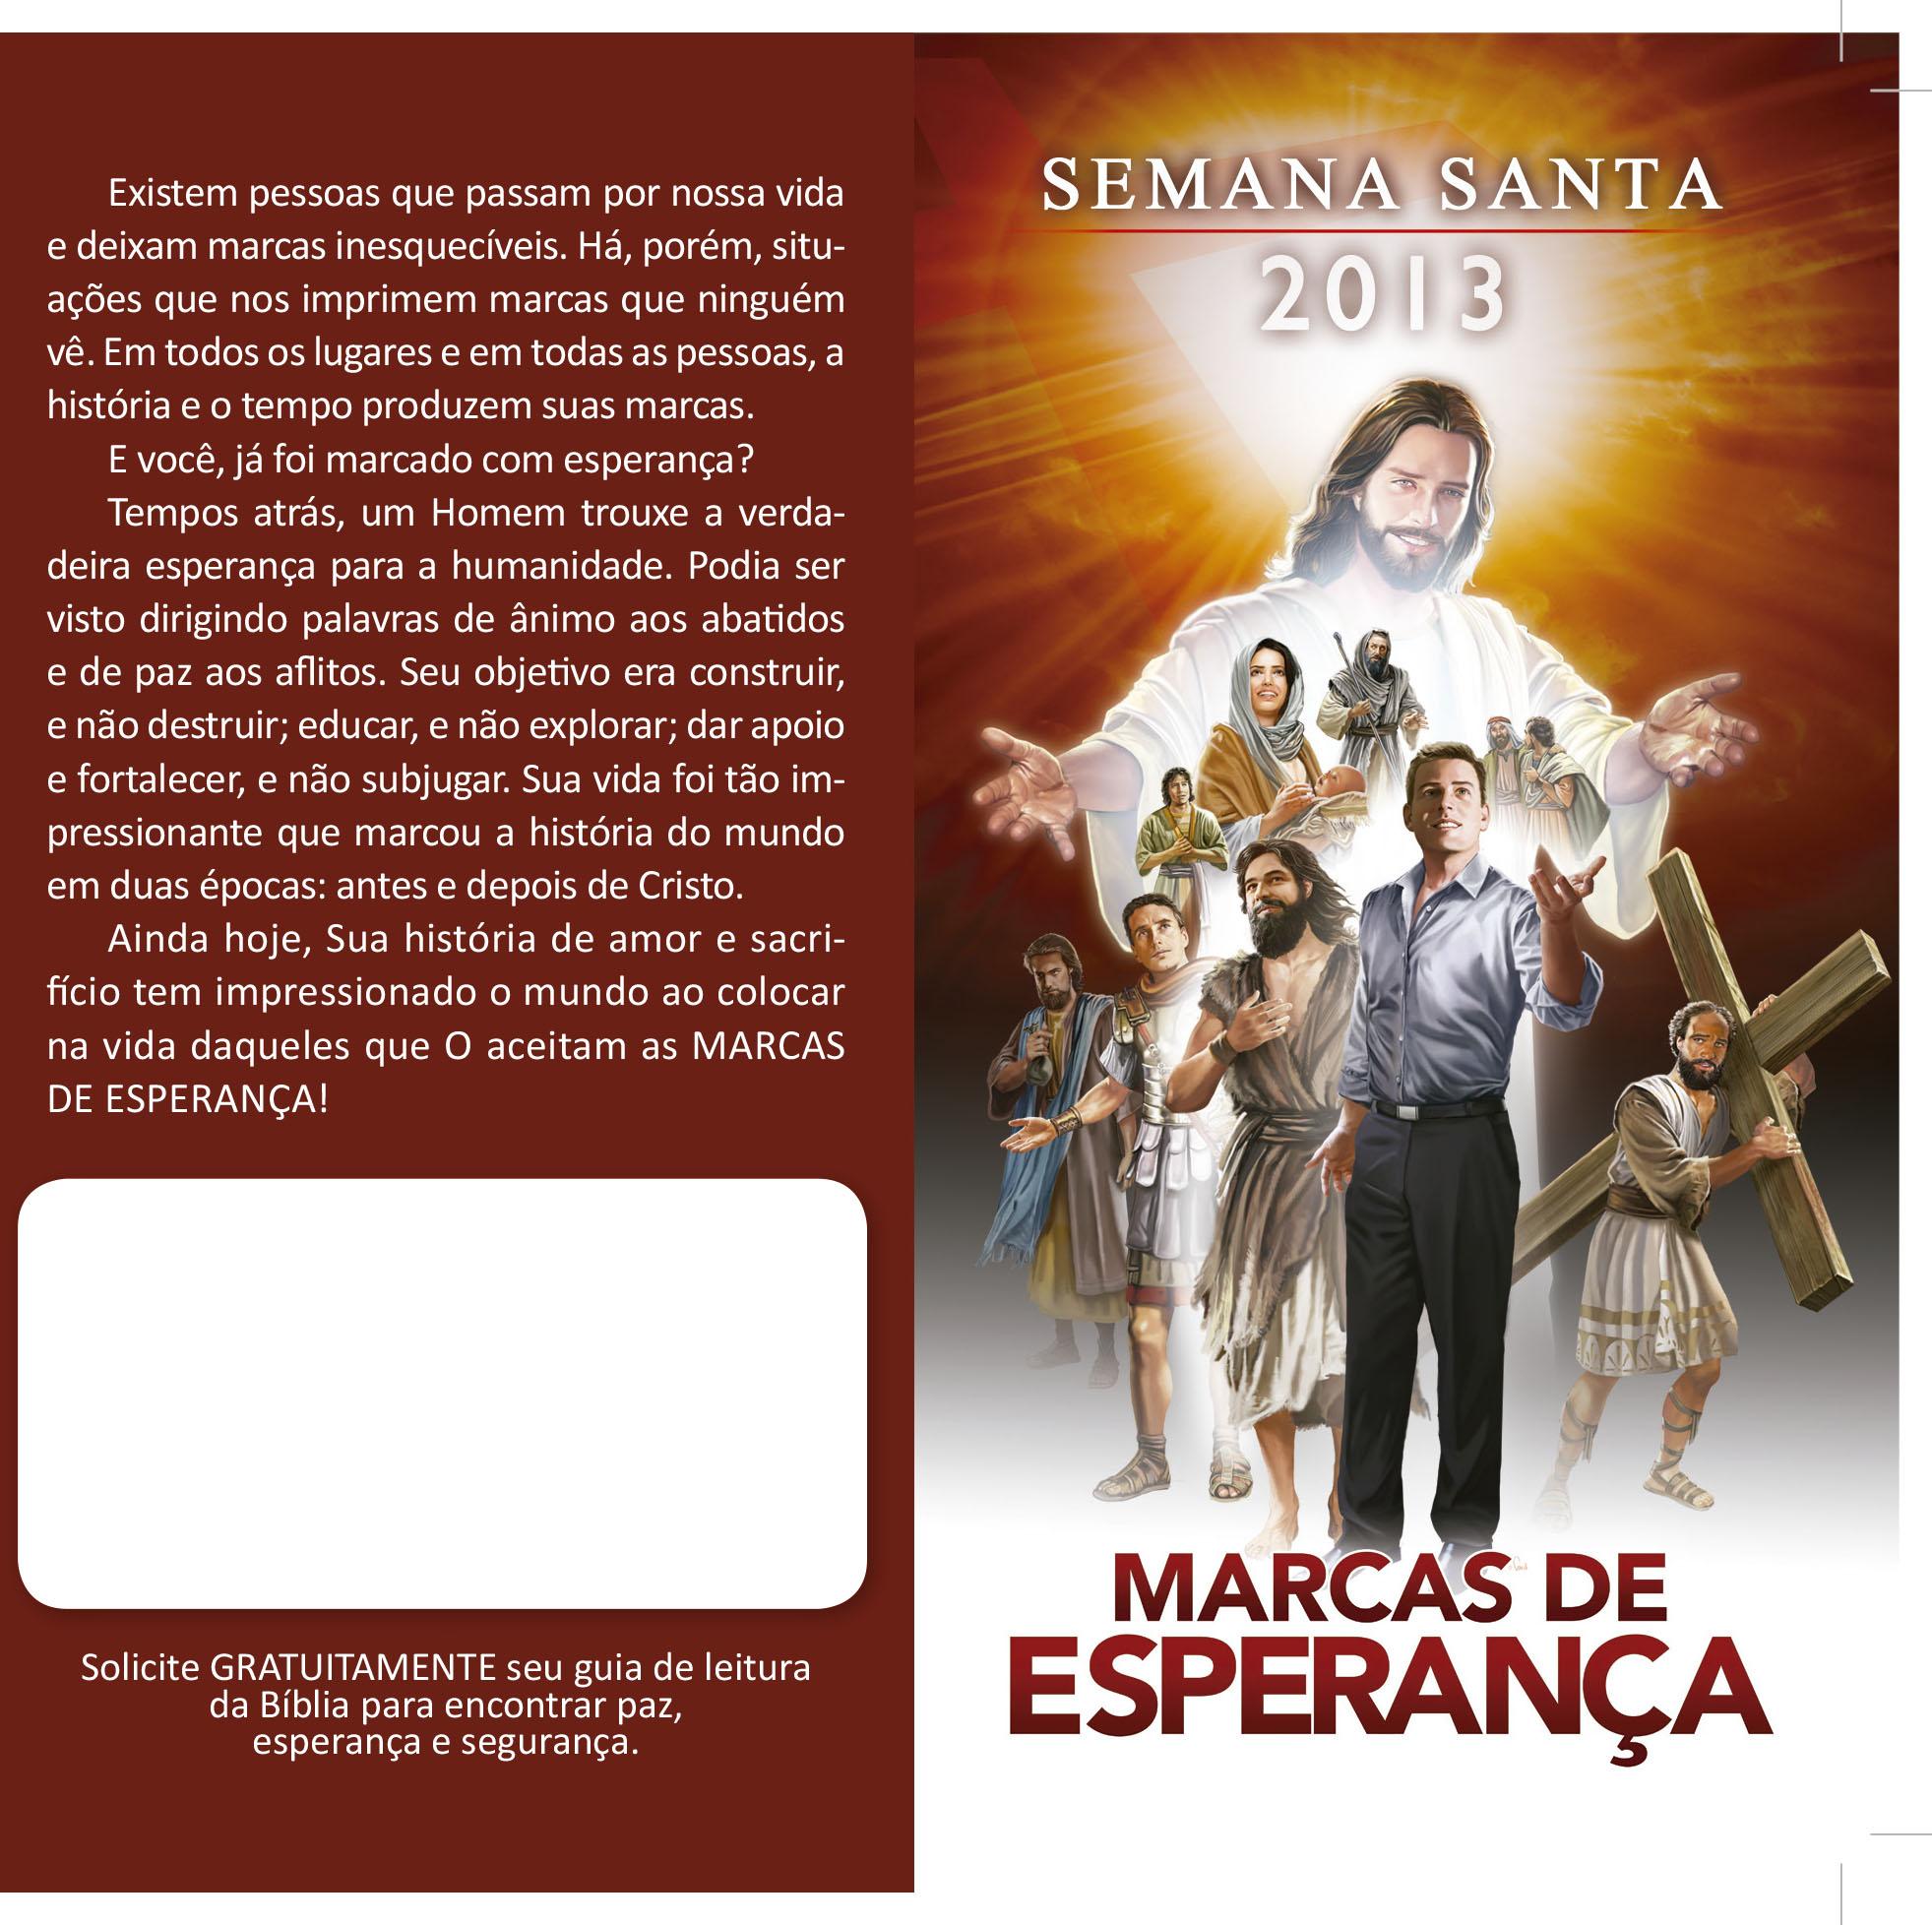 Folheto: Semana Santa 2013